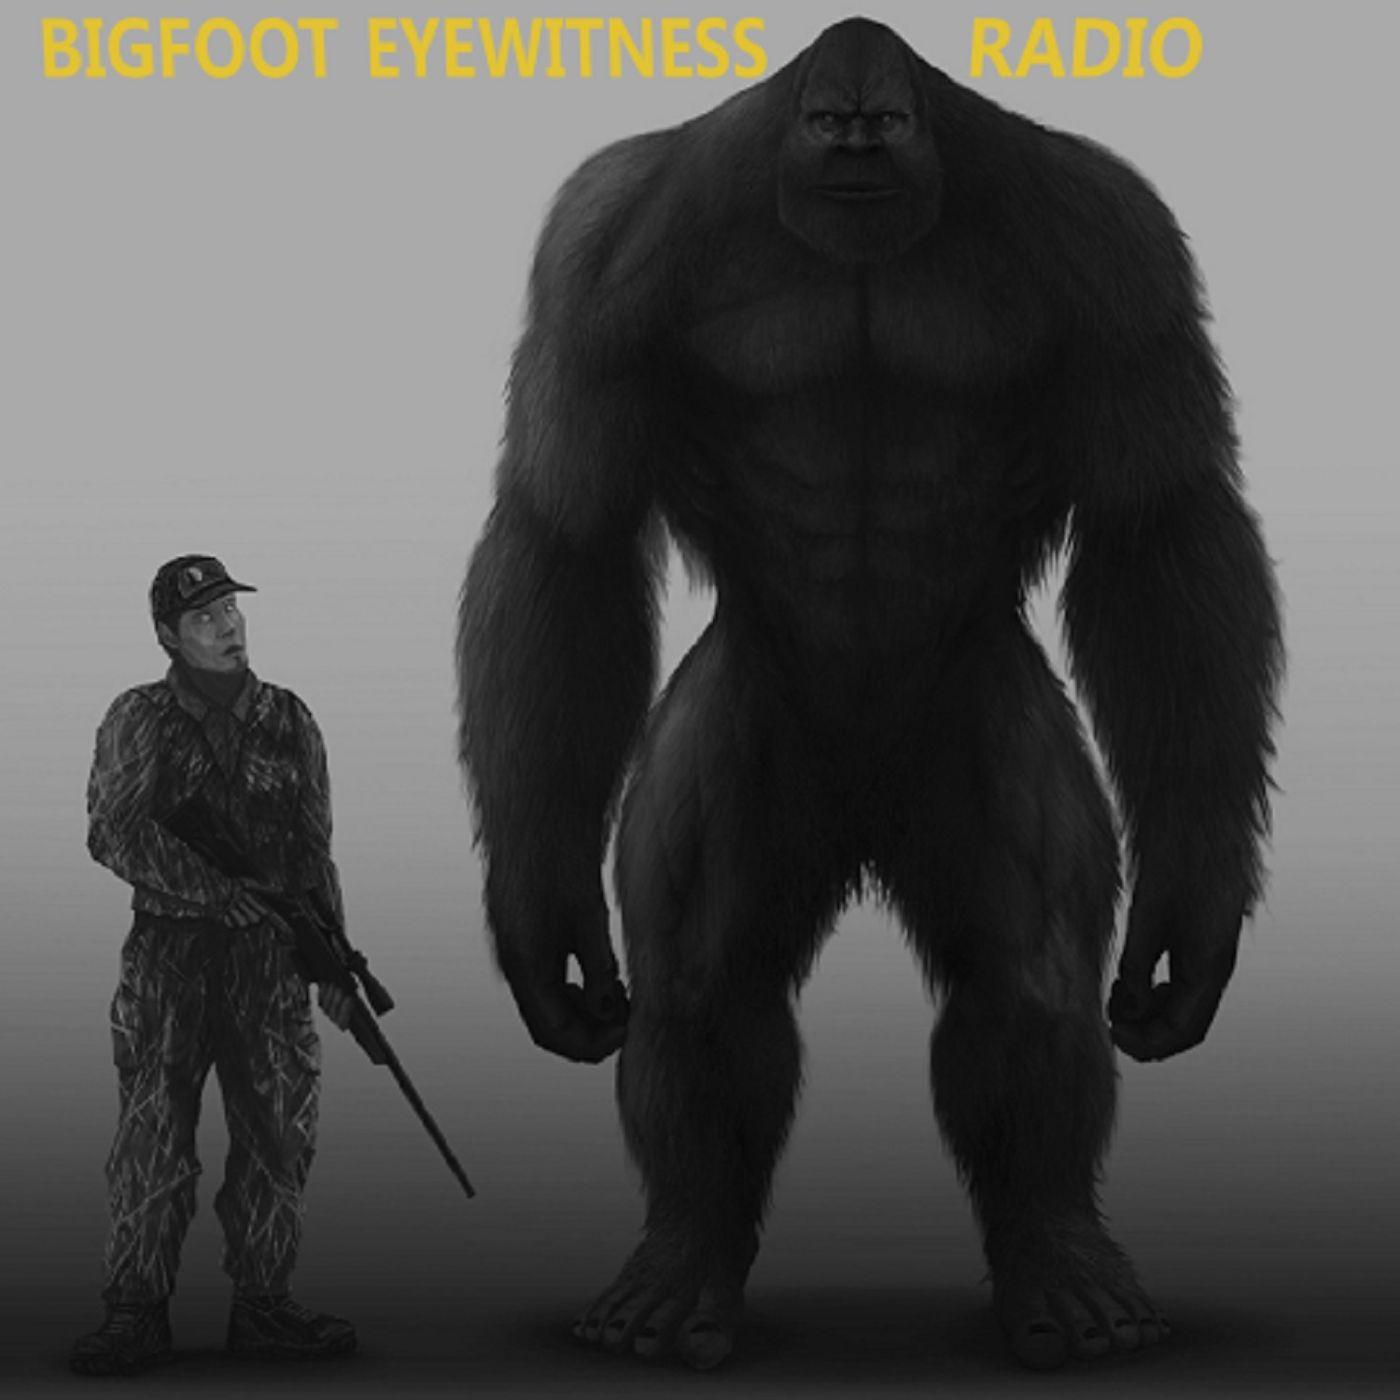 Bigfoot Eyewitness Episode 293 (The Old Man of the Woods)